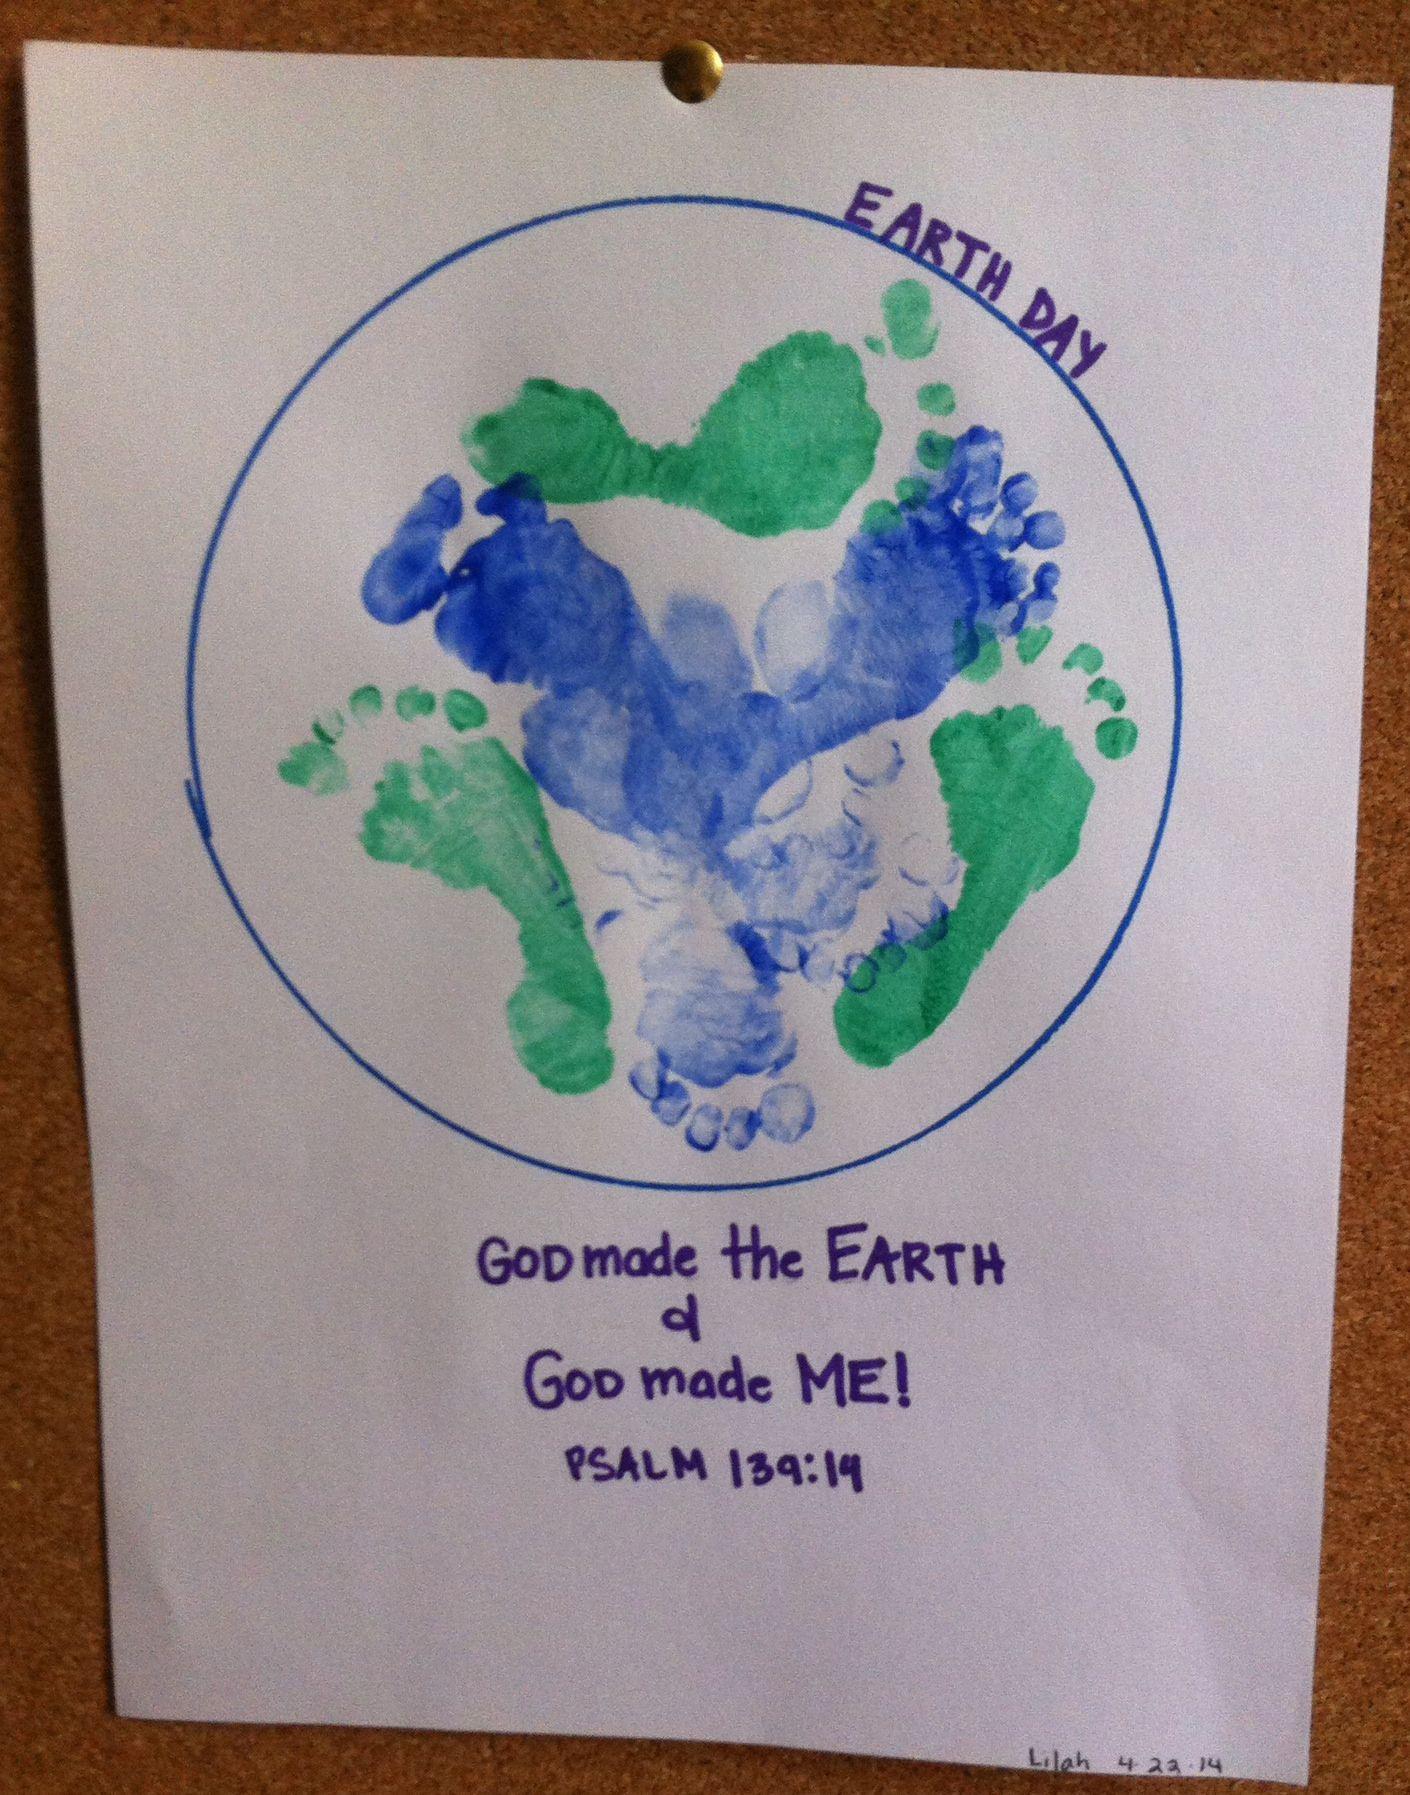 Earth day footprint craft crafts diy pinterest for World of war craft com